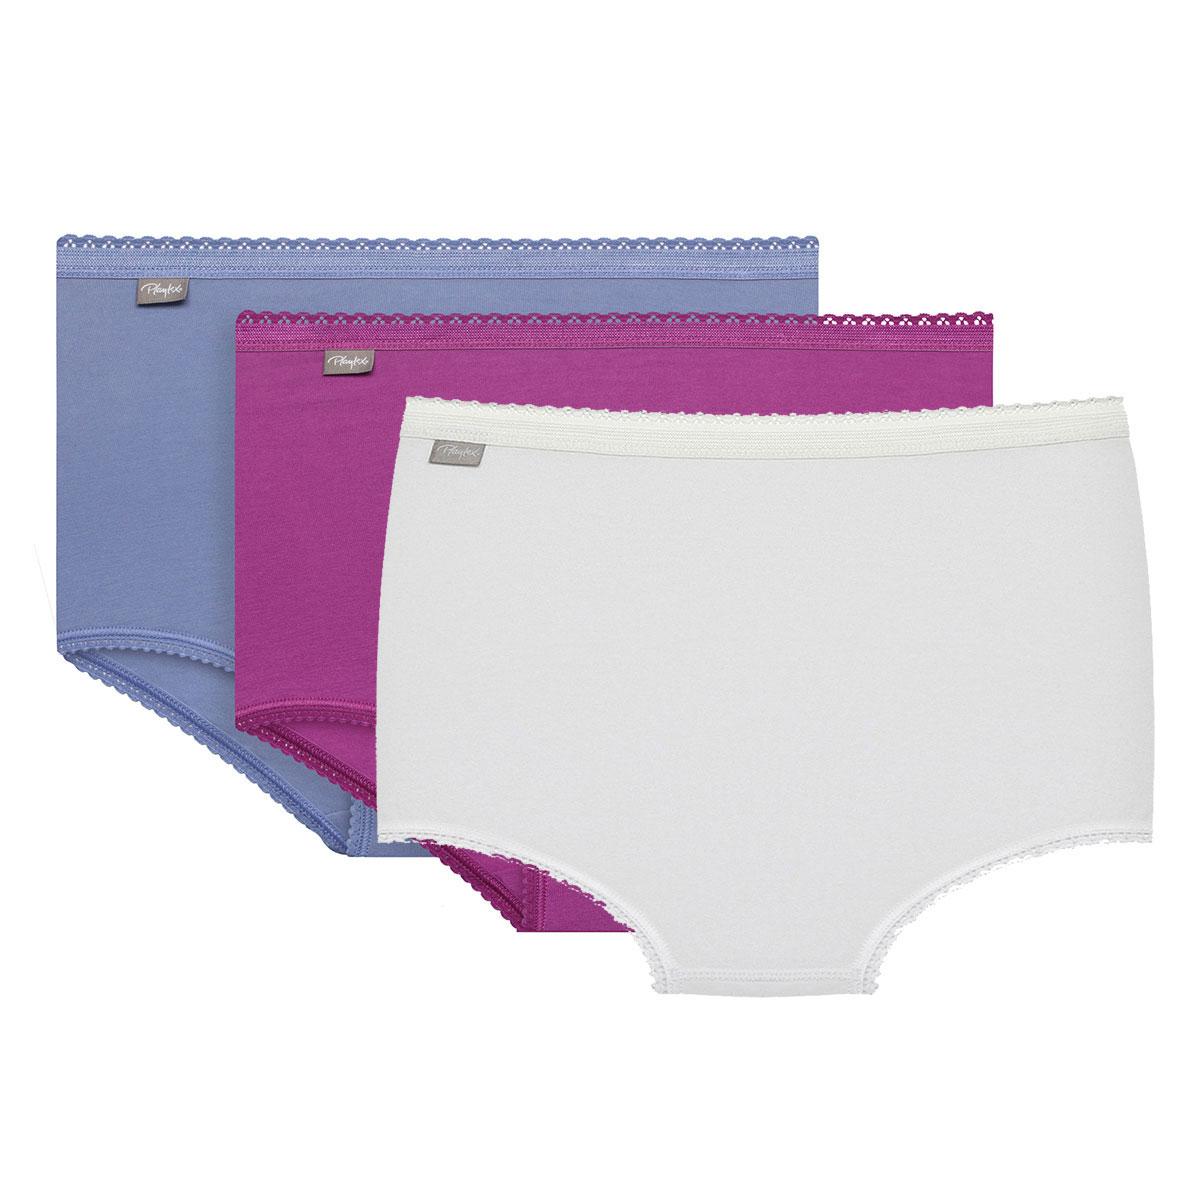 3 culottes Midi violette, parme et blanche - Coton Stretch-PLAYTEX